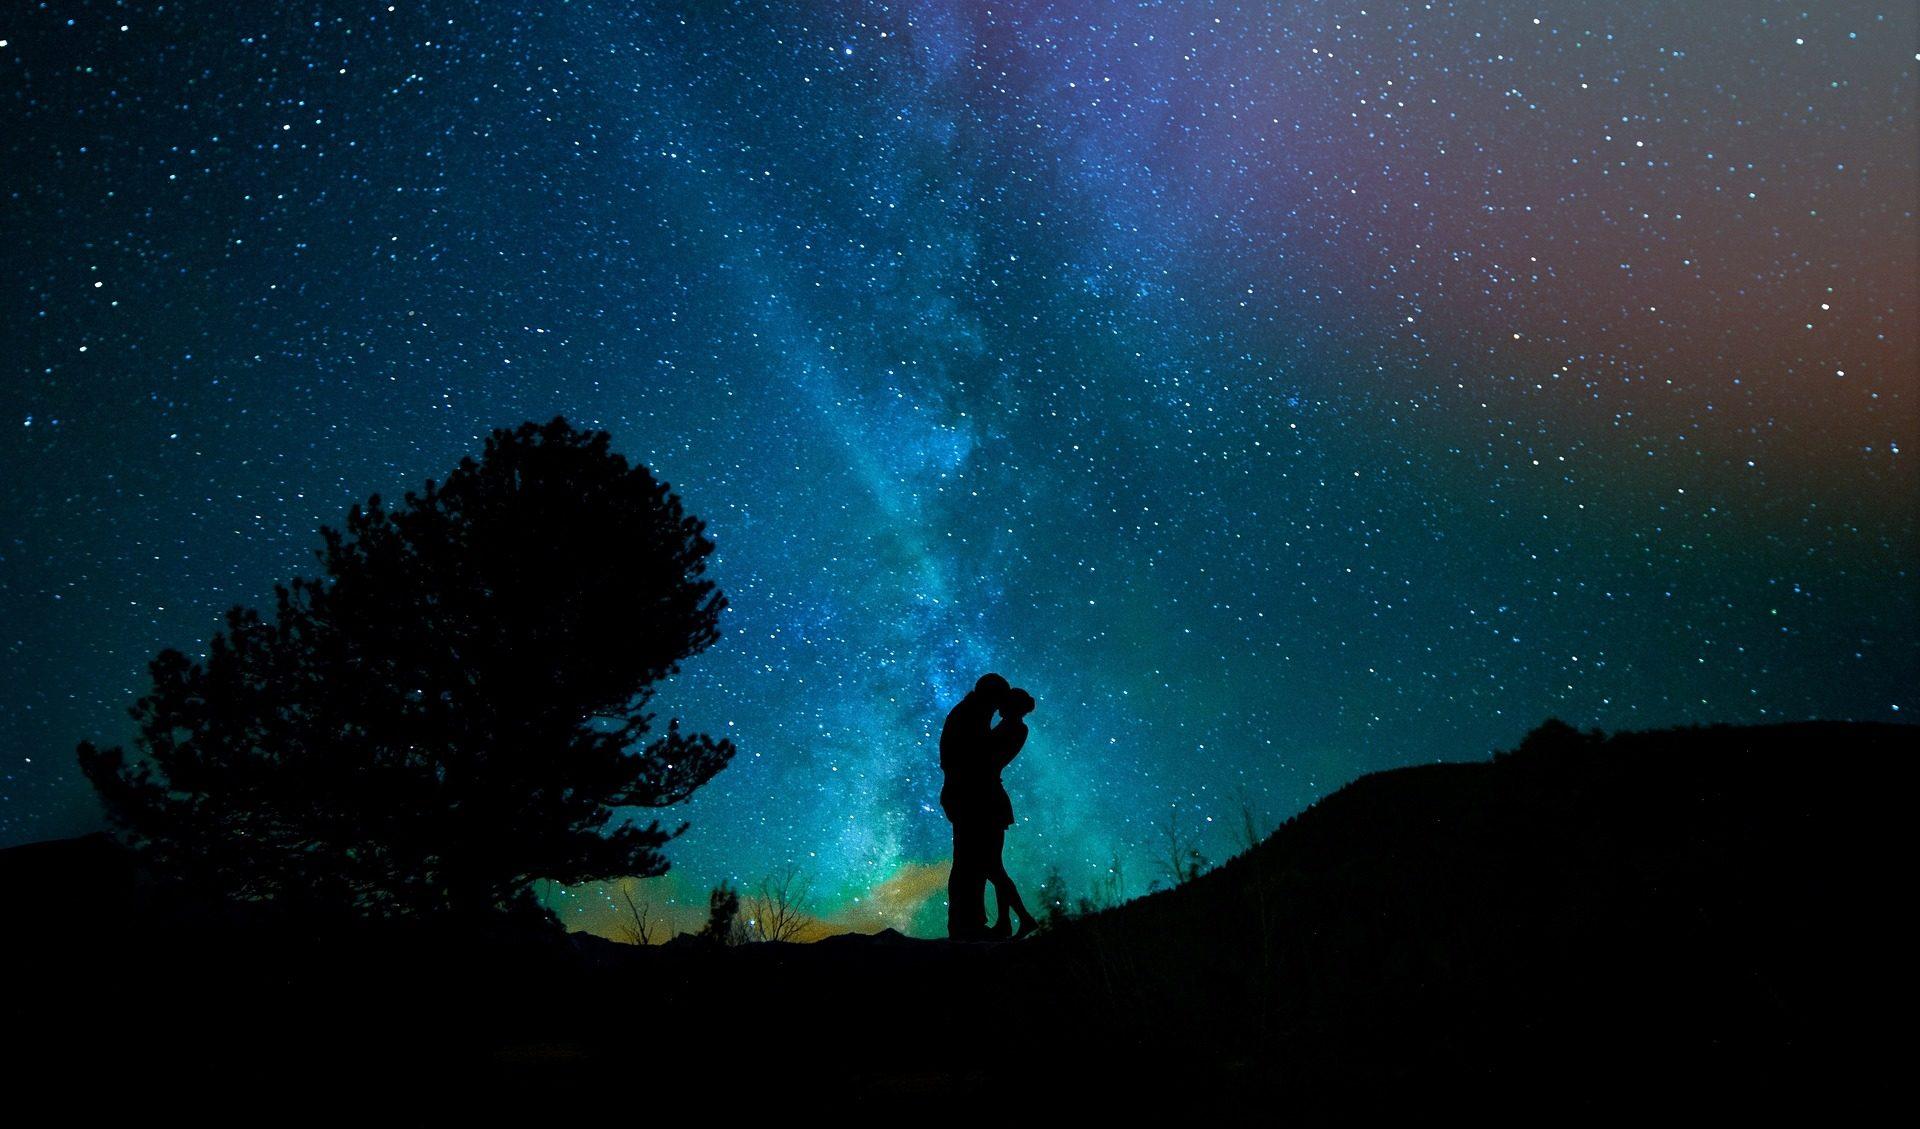 Cielo, notte, Amantes, Star, árbol - Sfondi HD - Professor-falken.com